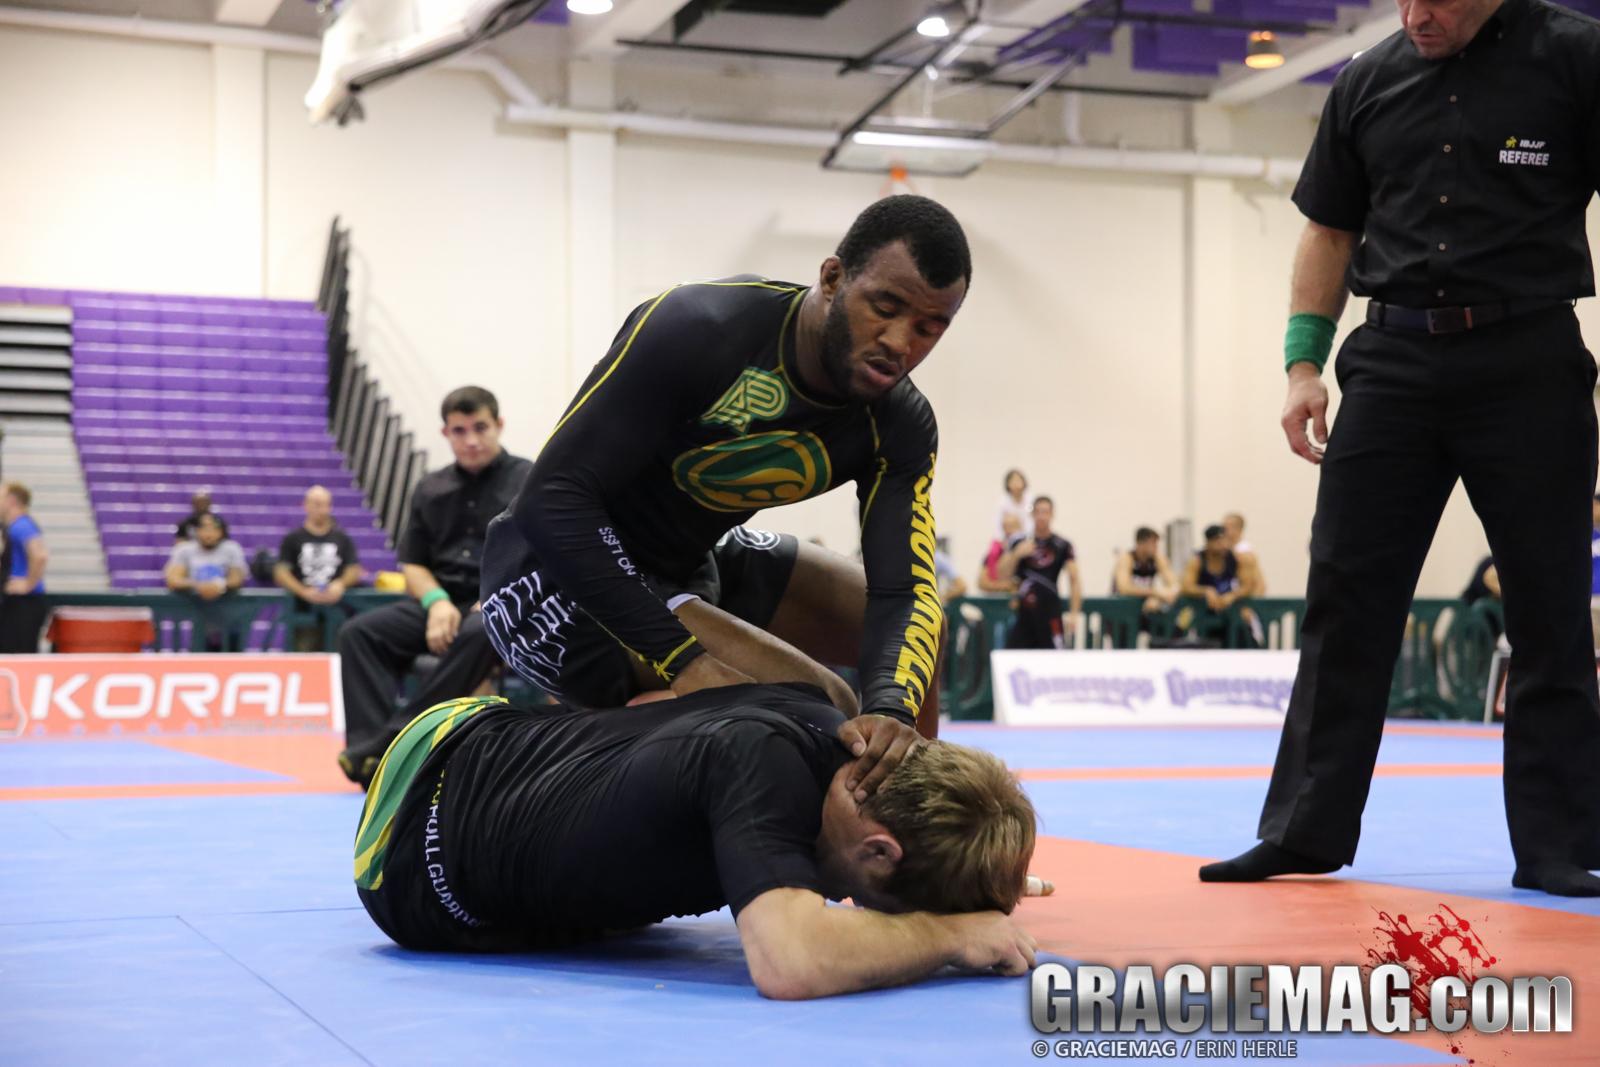 Jackson Sousa usou a pressão para vencer AJ na final do absoluto. Foto: Erin Herle/GRACIEMAG